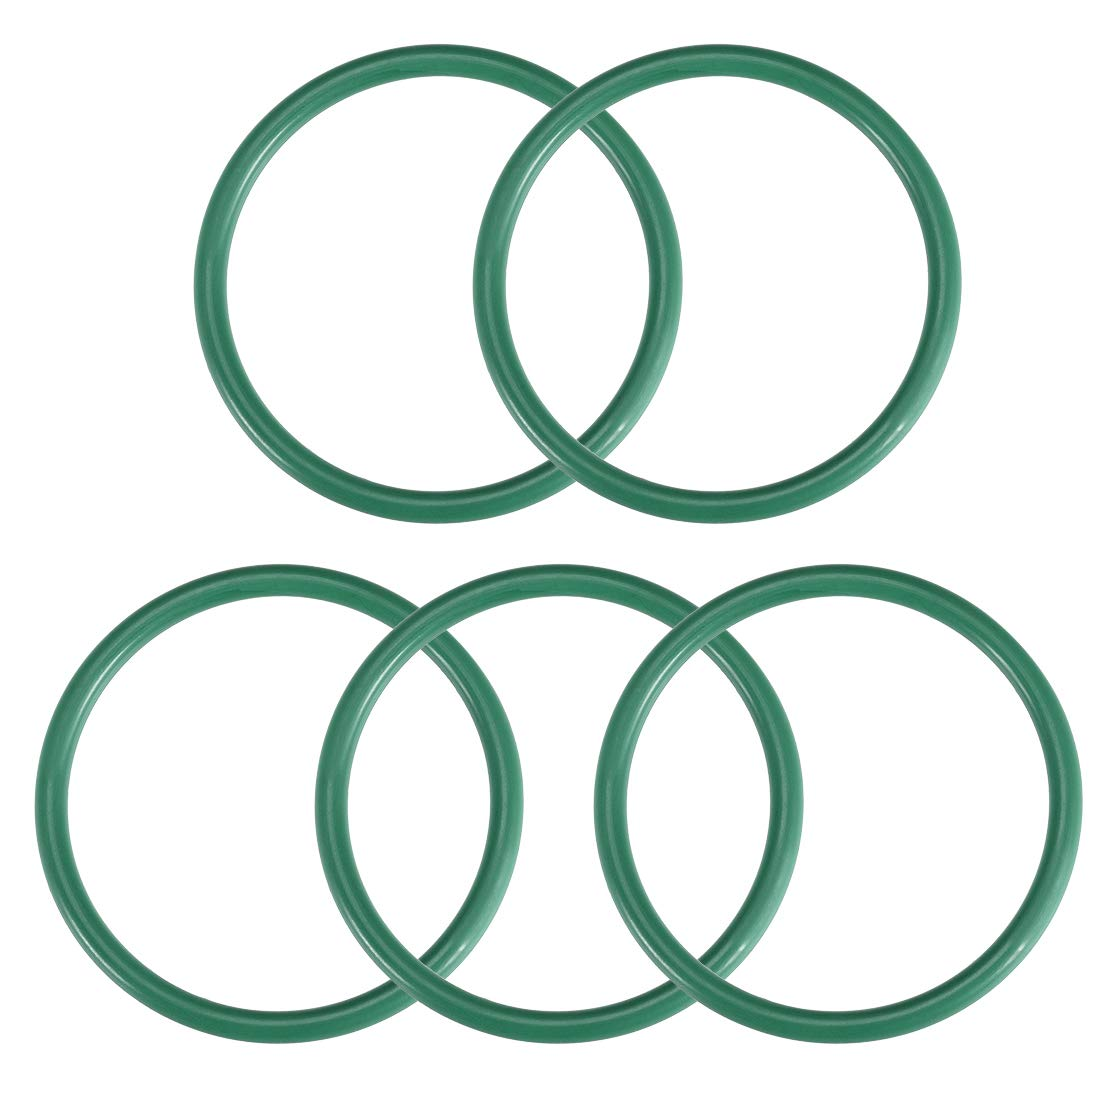 43mm Inner Diameter 50mm OD 3.5mm Width uxcell Fluorine Rubber O Rings Seal Gasket Green 5Pcs